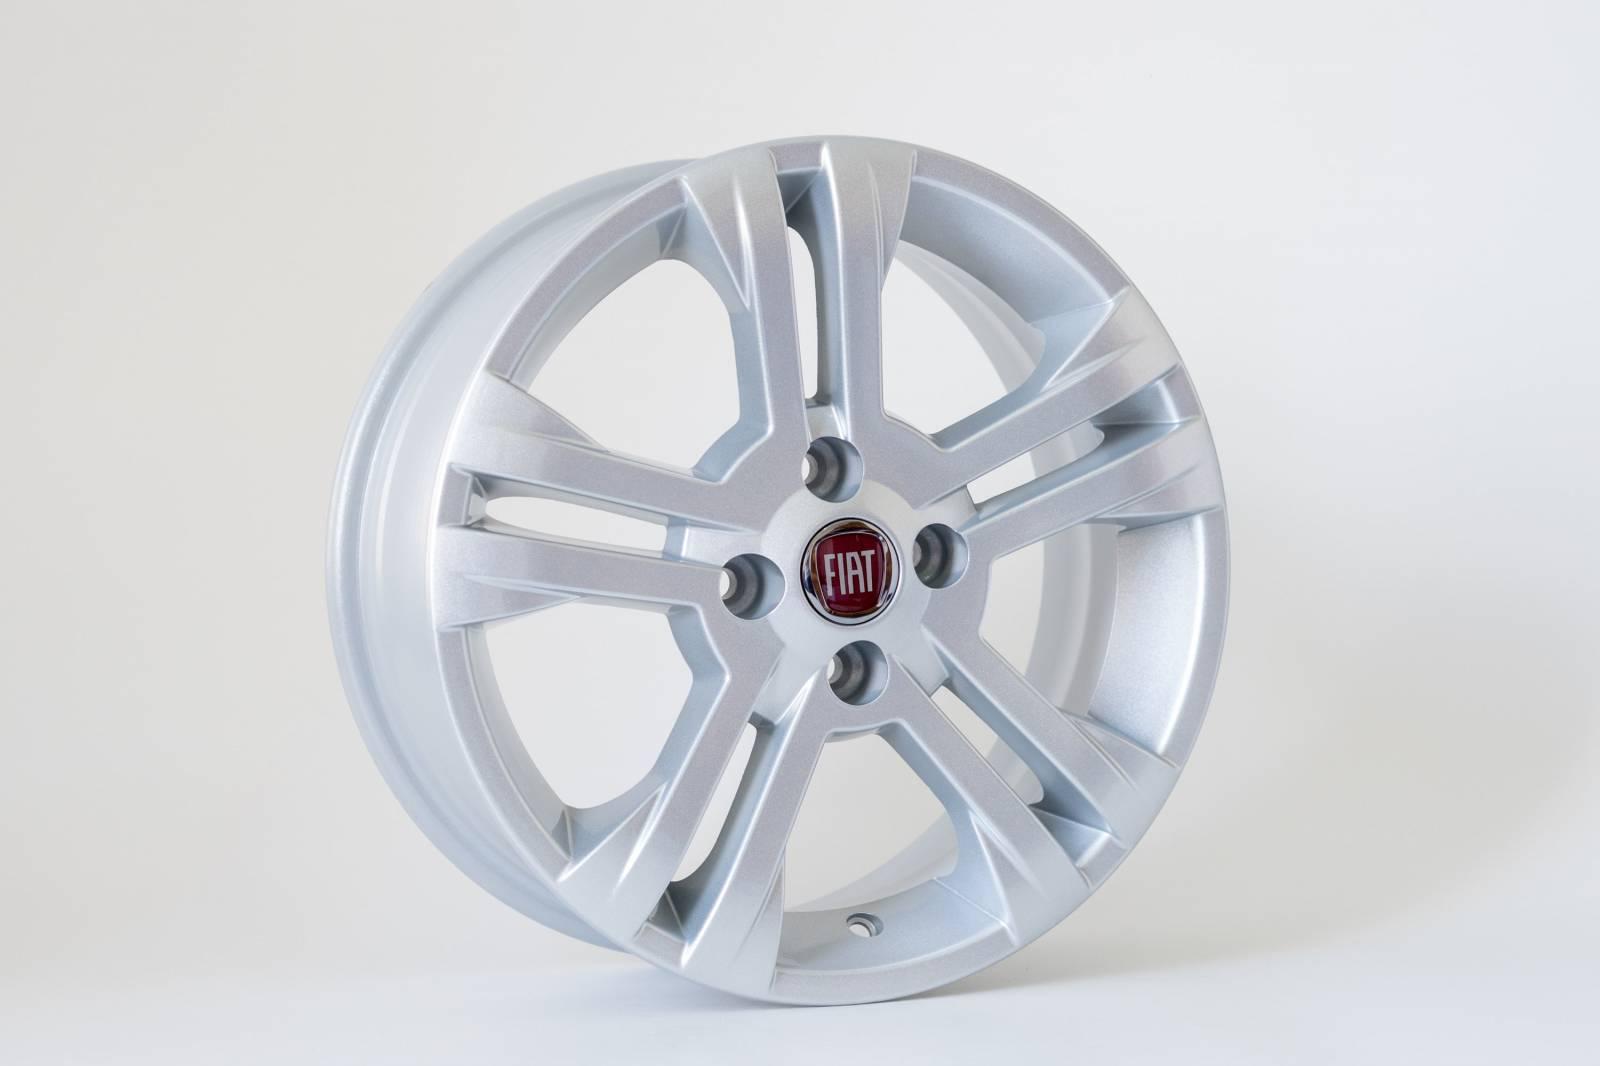 Jogo de 04 Rodas Fiat New Palio aro 15 4x98 KR R17 Prata